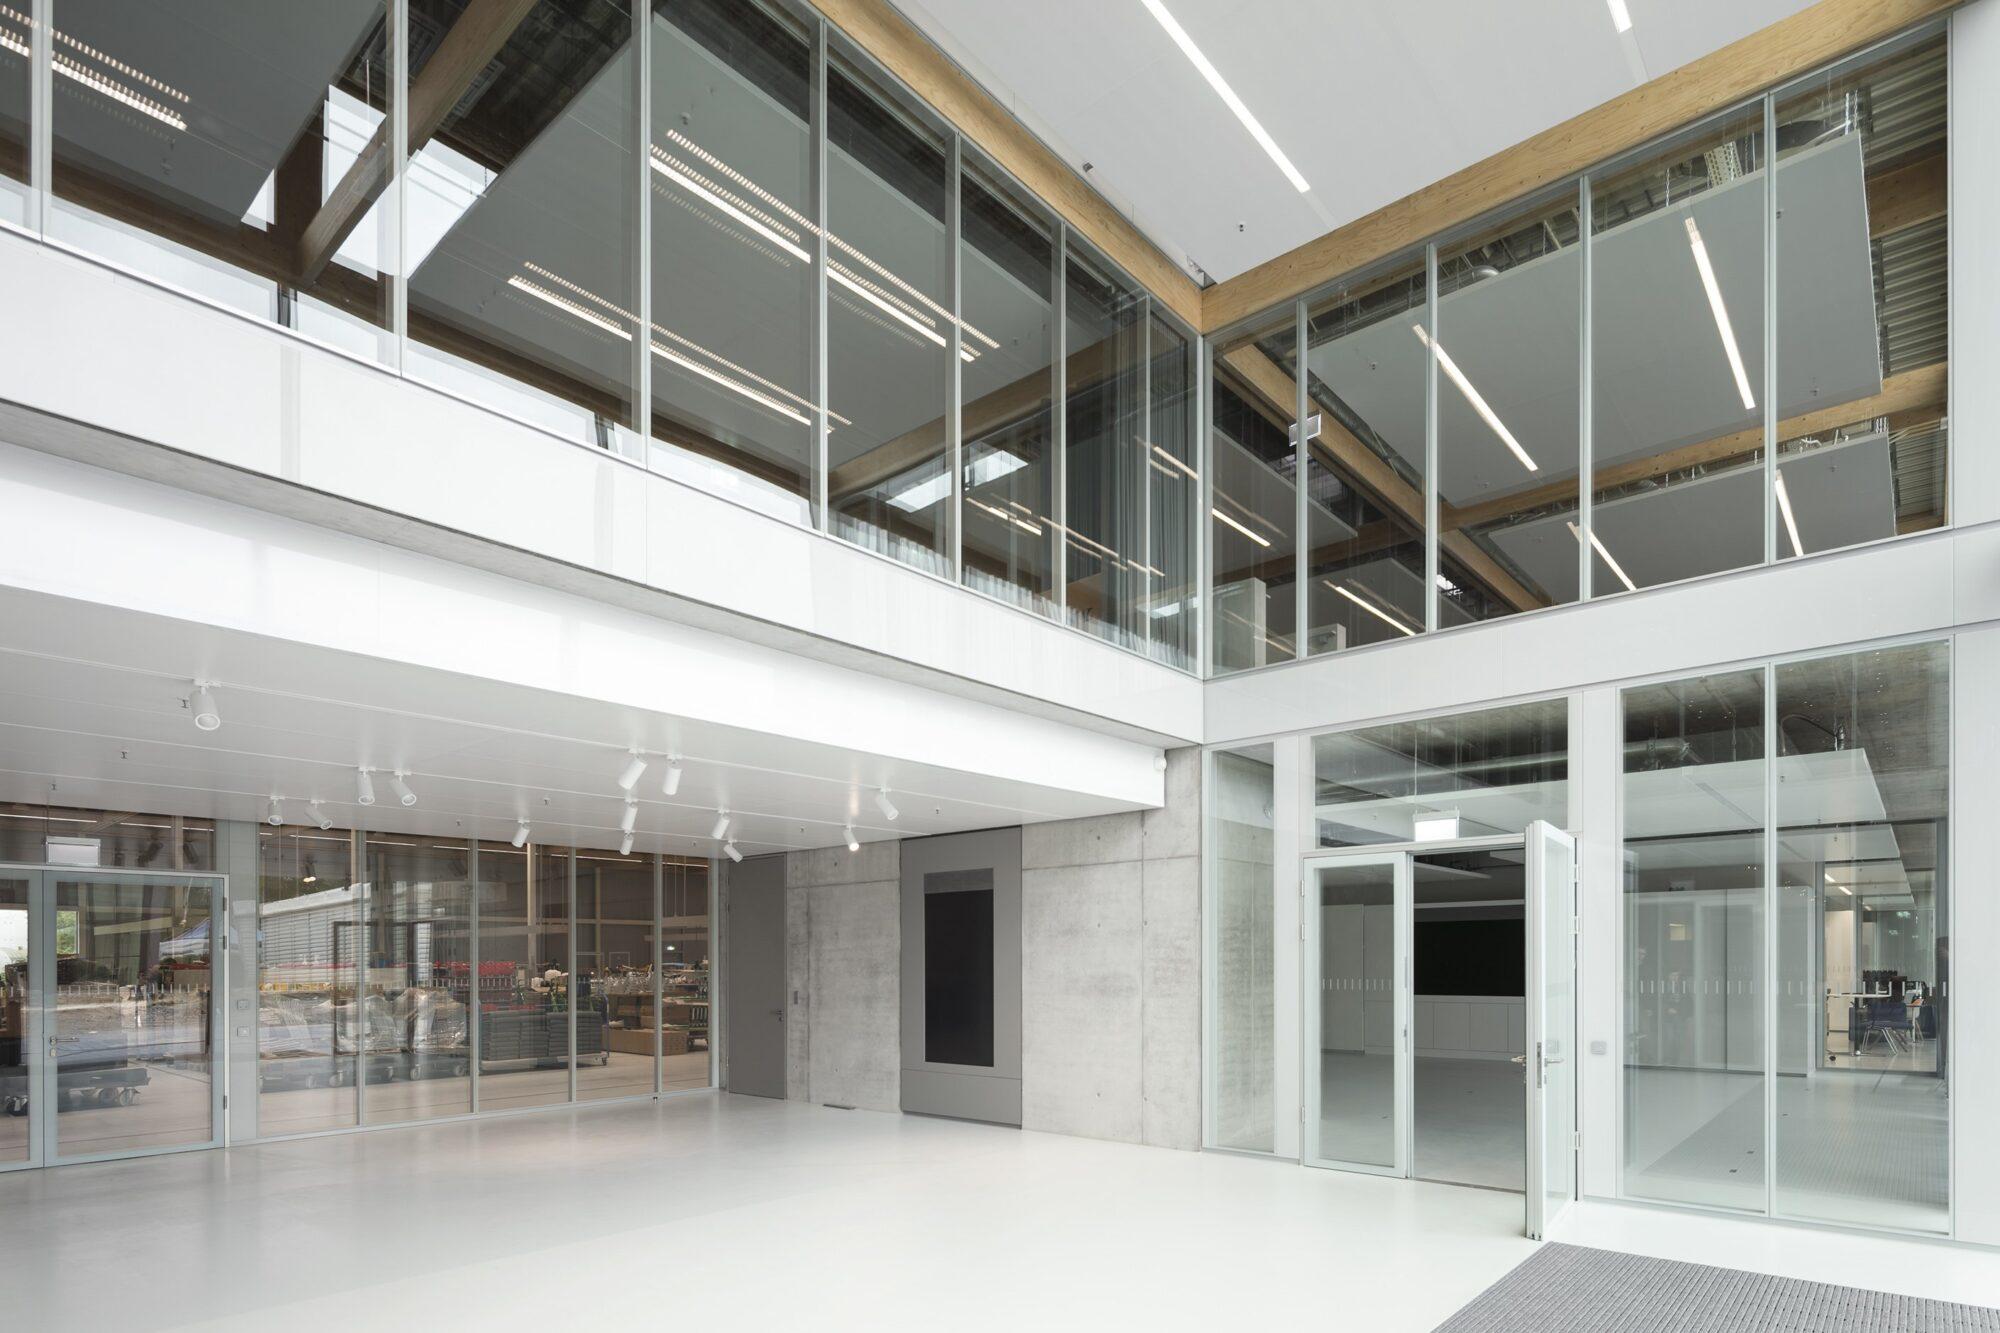 fecostruct│feco partition walls│Brunner Innovation Factory